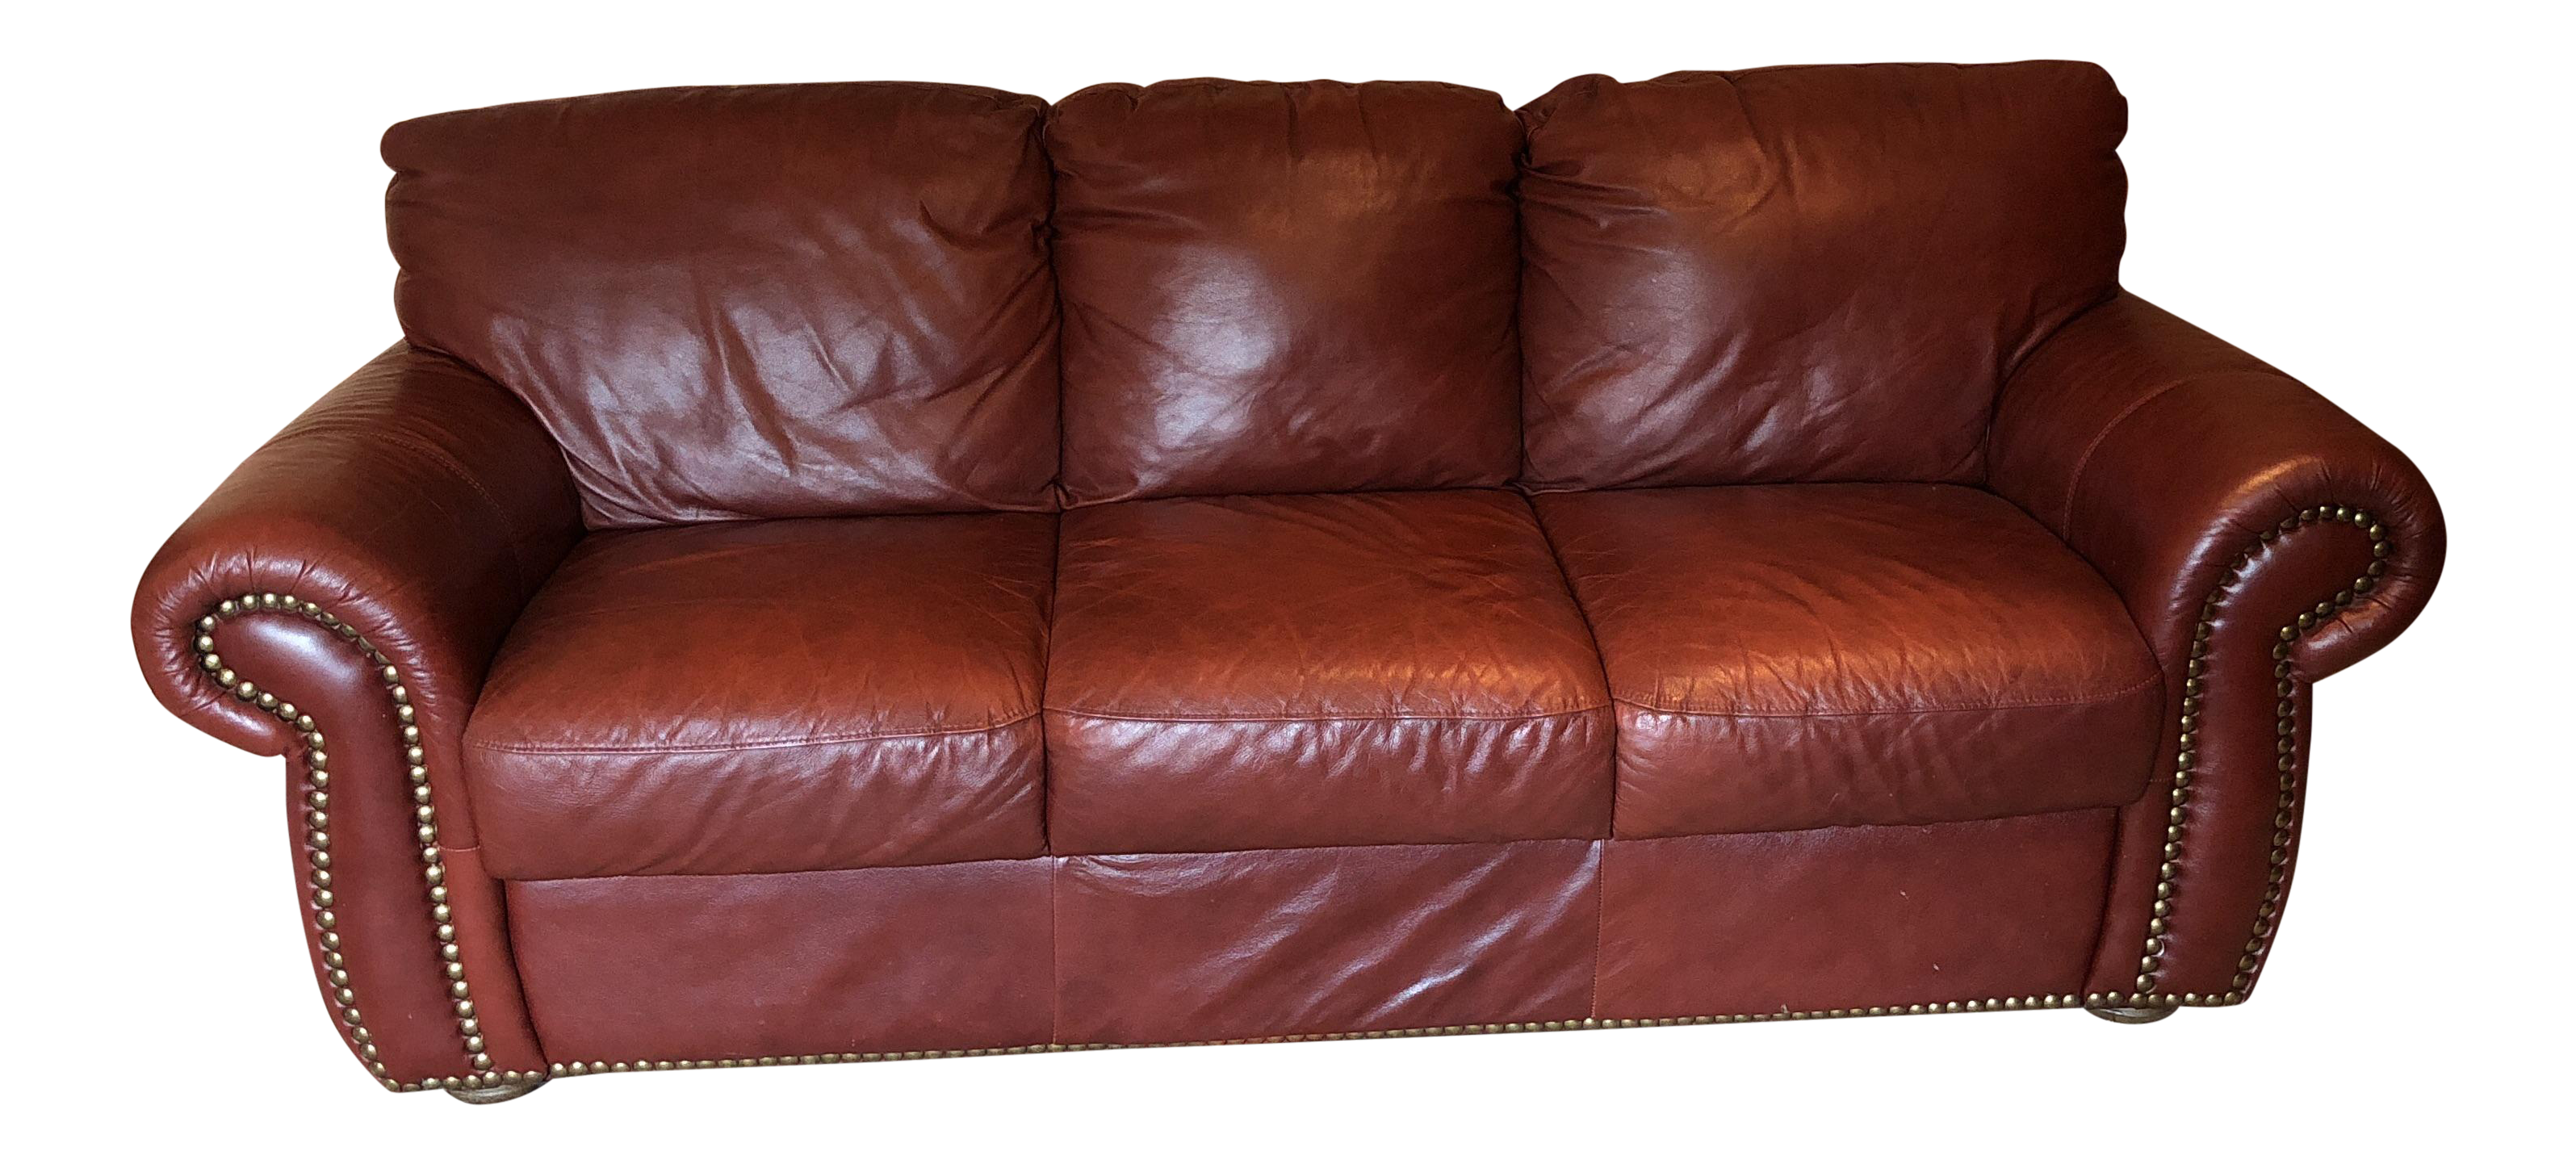 Exceptionnel Chateau Du0027Ax Divani Italian Red Leather Sofa